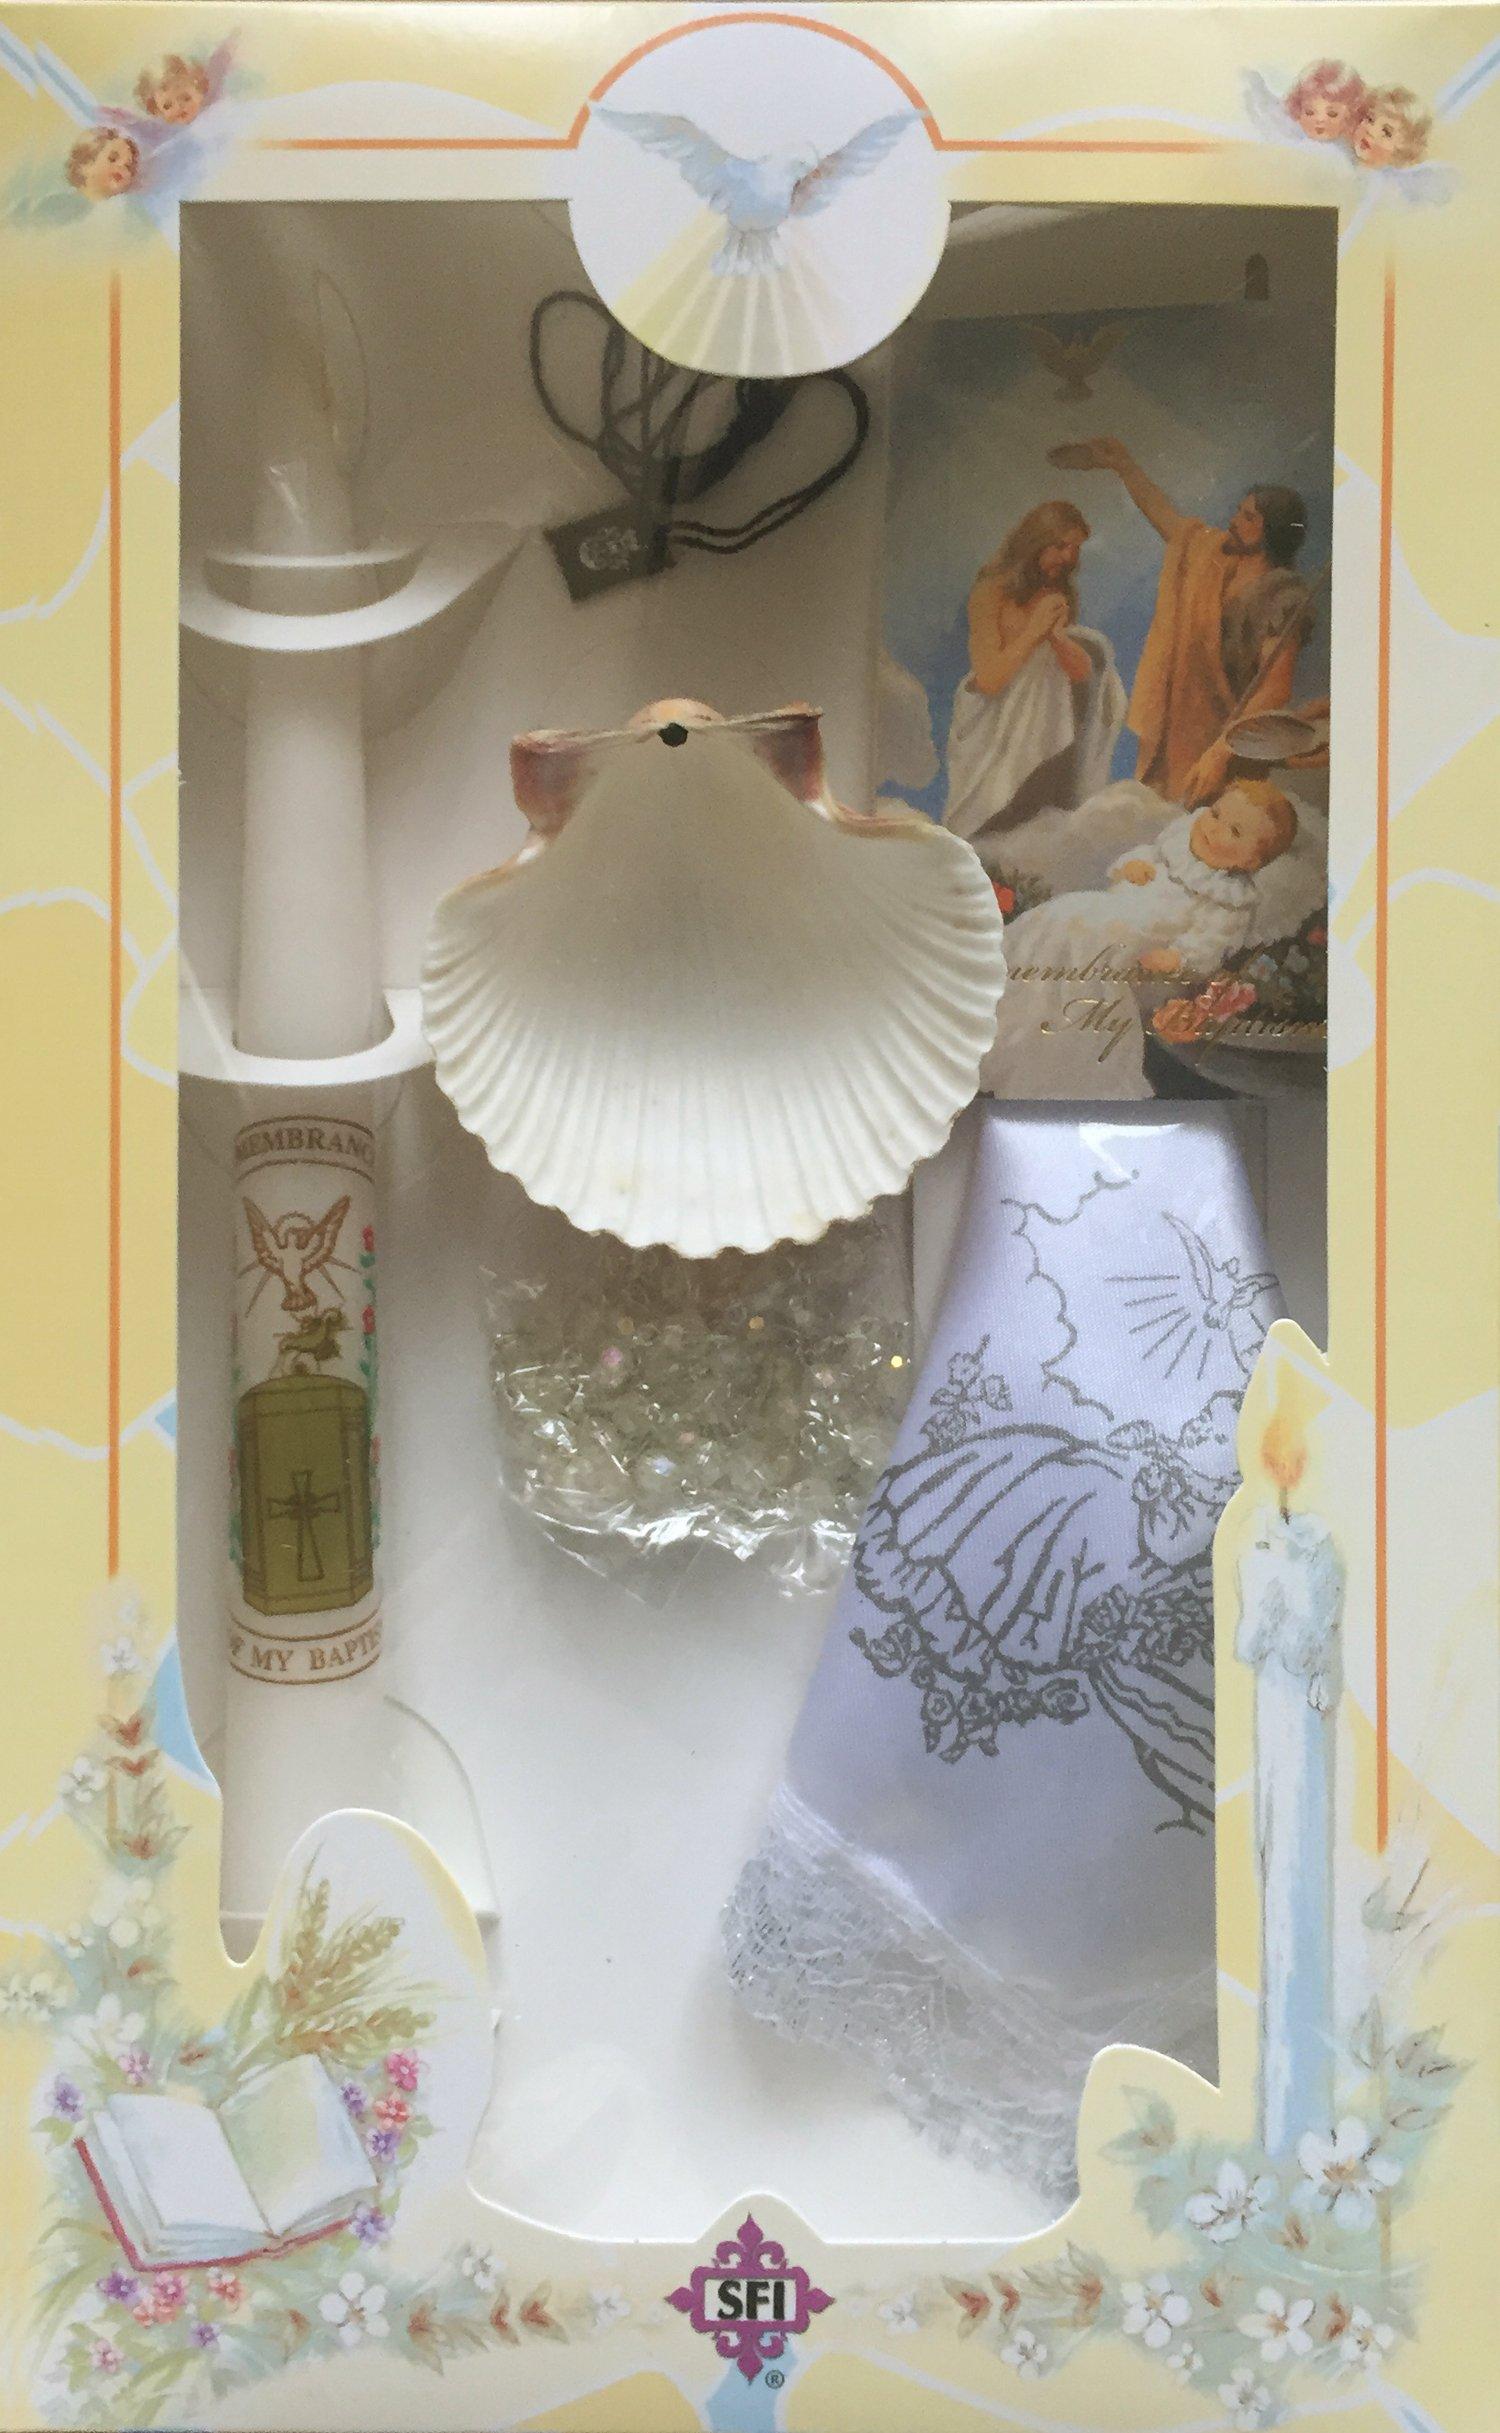 New Boys or Girls Christening Baptism Candle Box Gift Set Shell Missal in Spanish Juego de Vela Bautizo Espanol